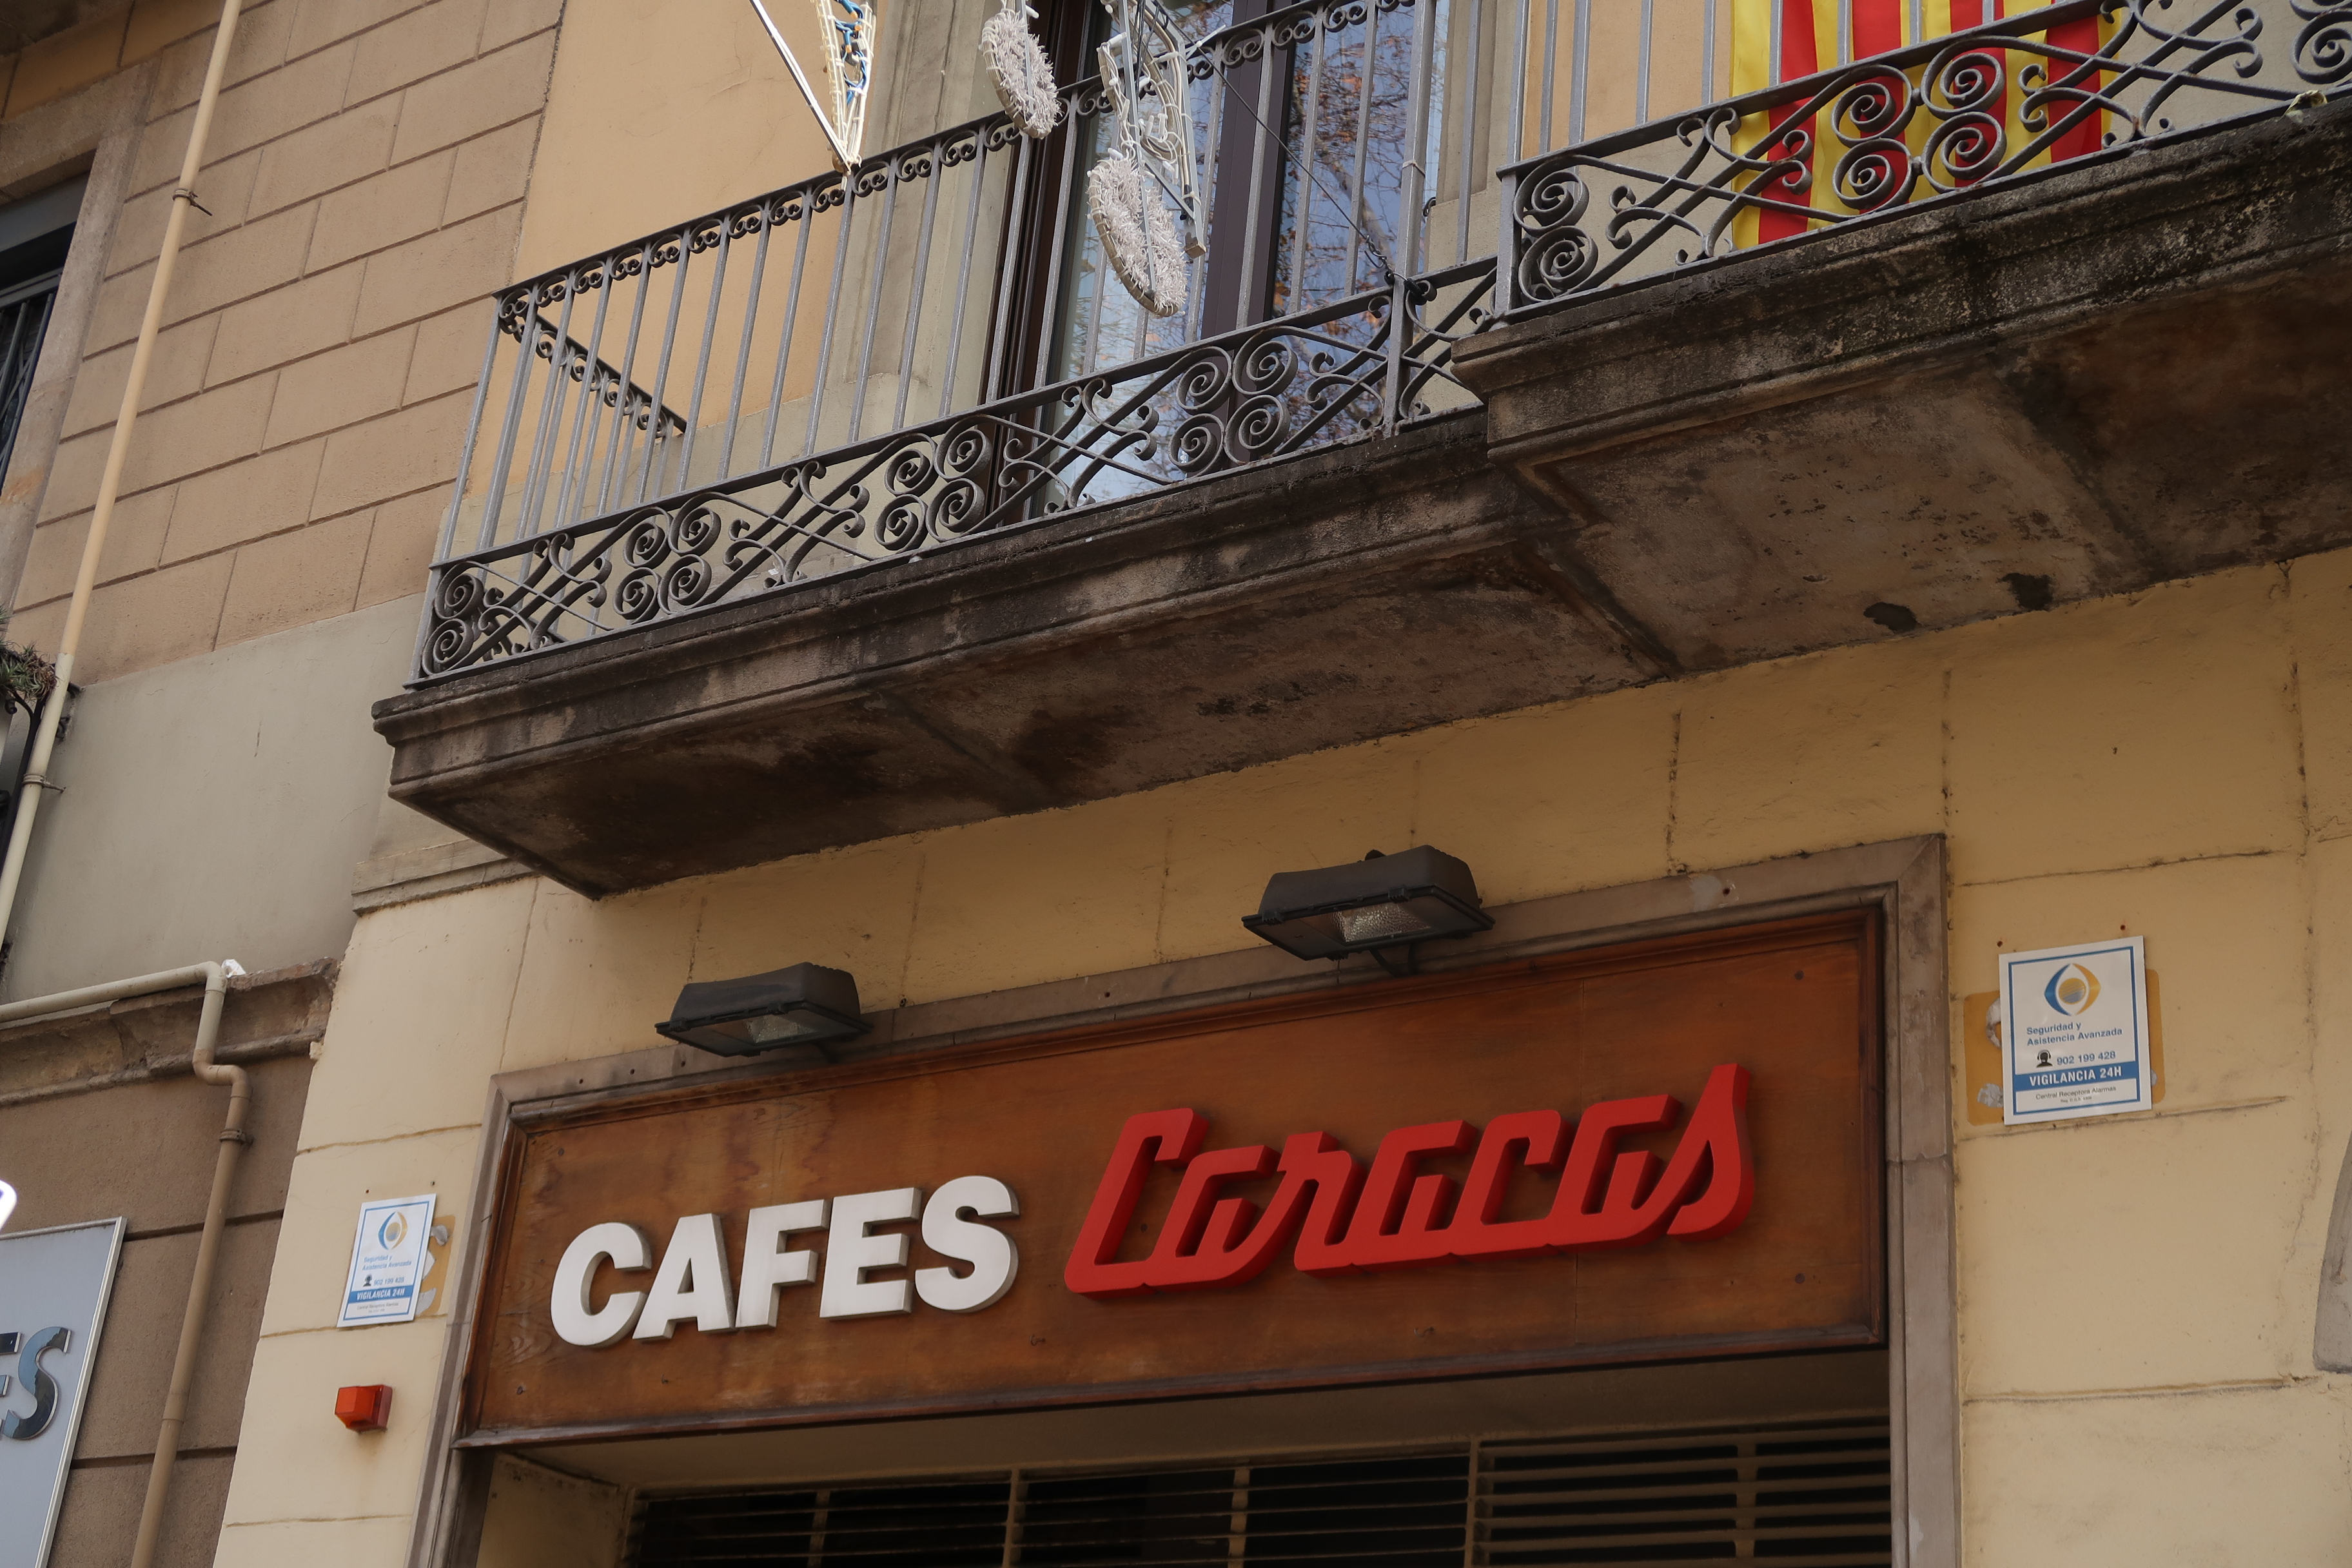 Coffee Shop, Cafes Caracas, Ronda de San Antoni, Barcelona